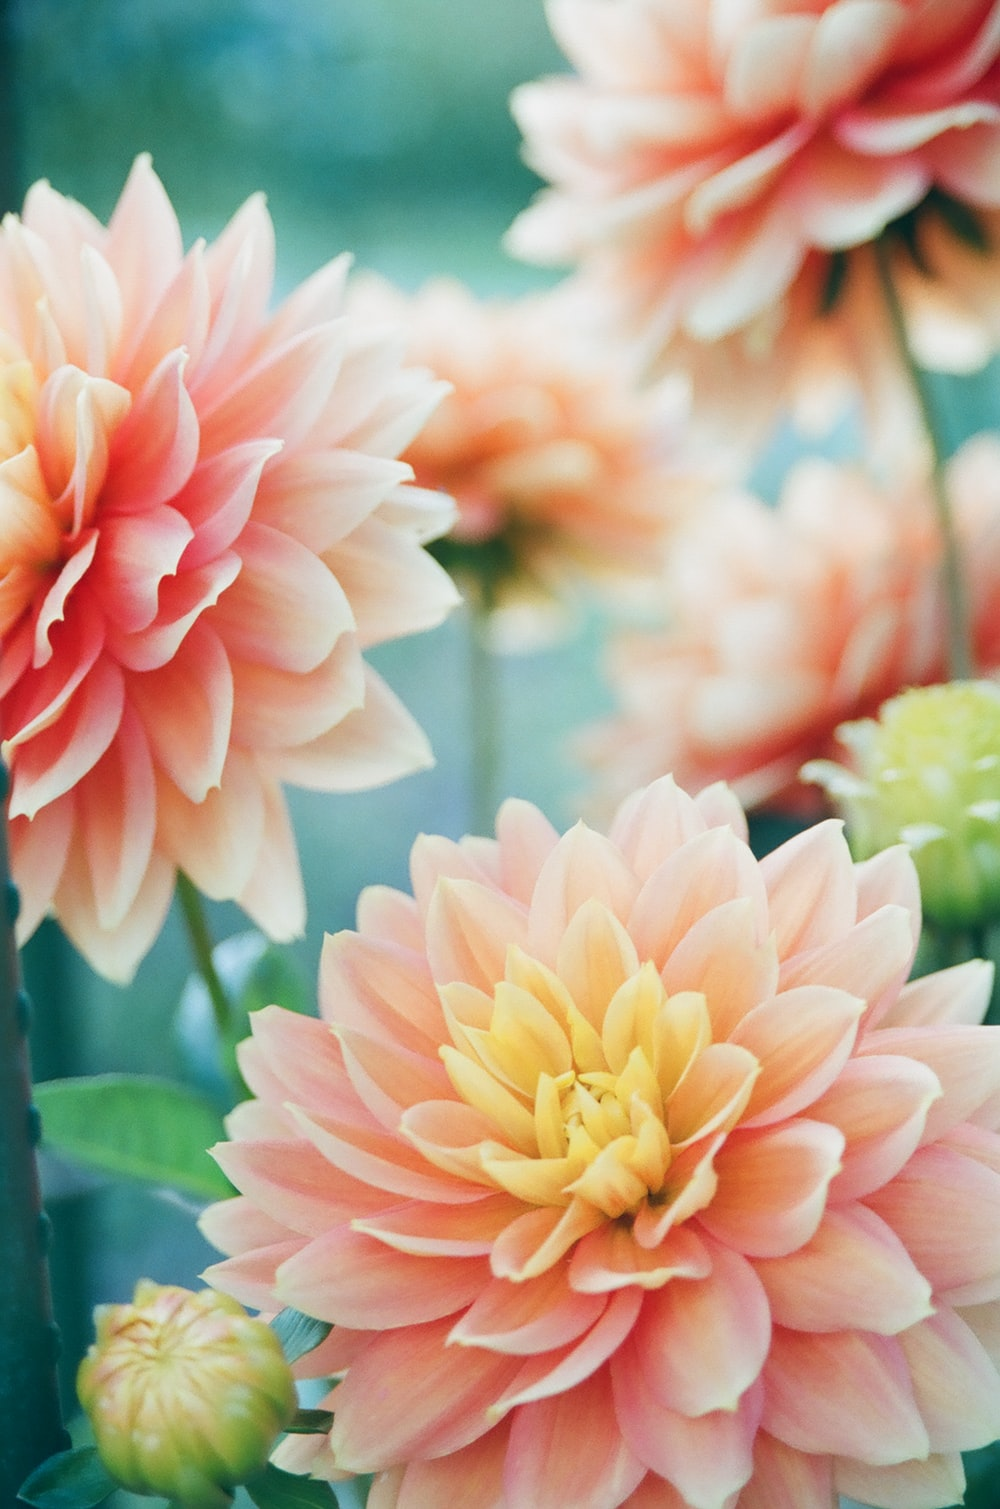 Flower Wallpapers Free HD Download [12+ HQ]   Unsplash